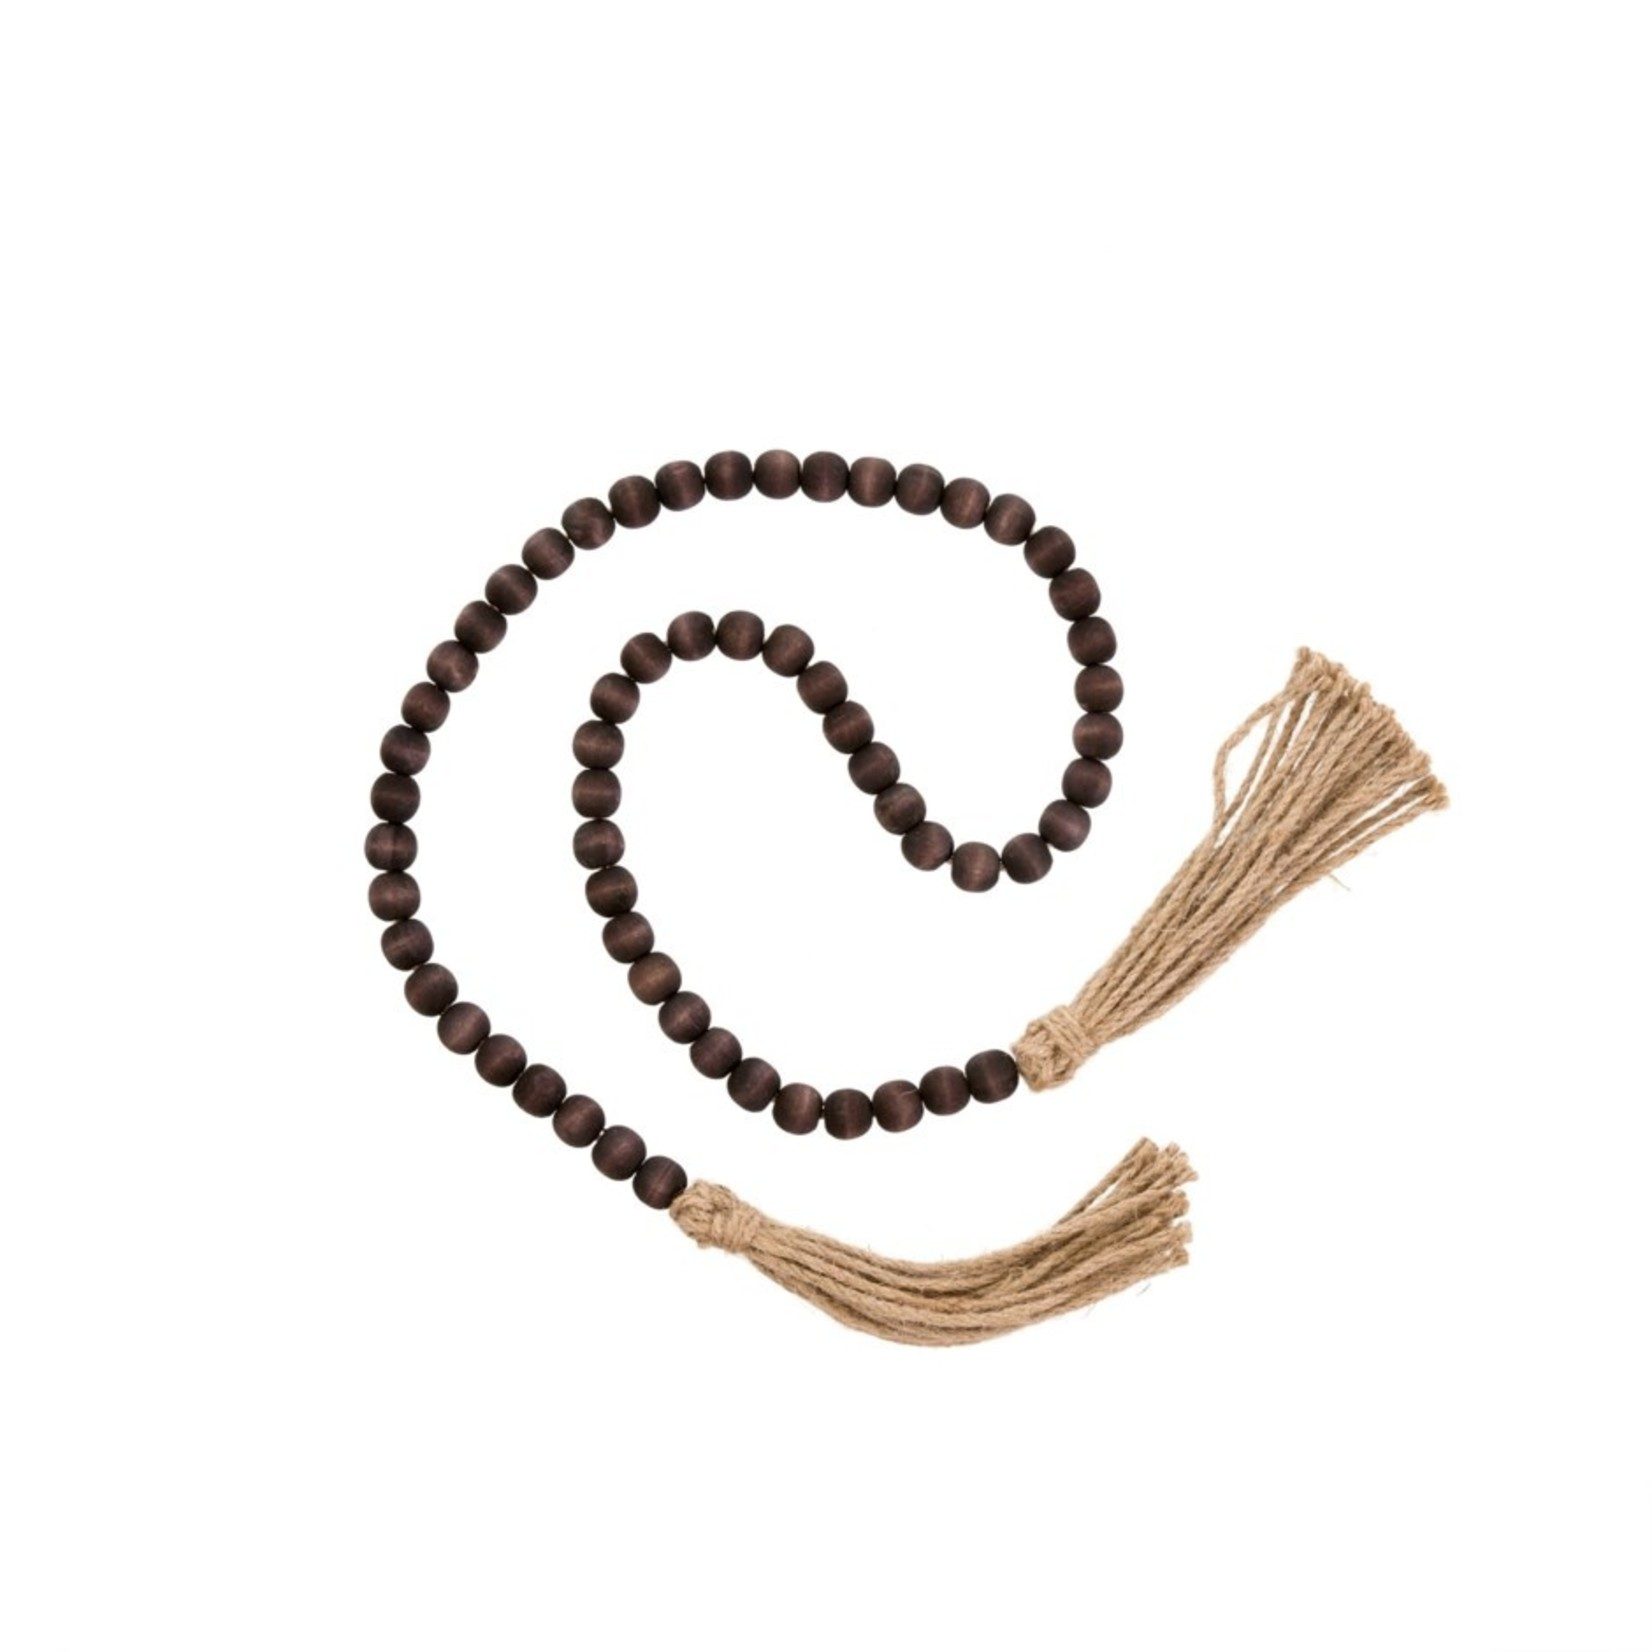 Tassel Prayer Beads